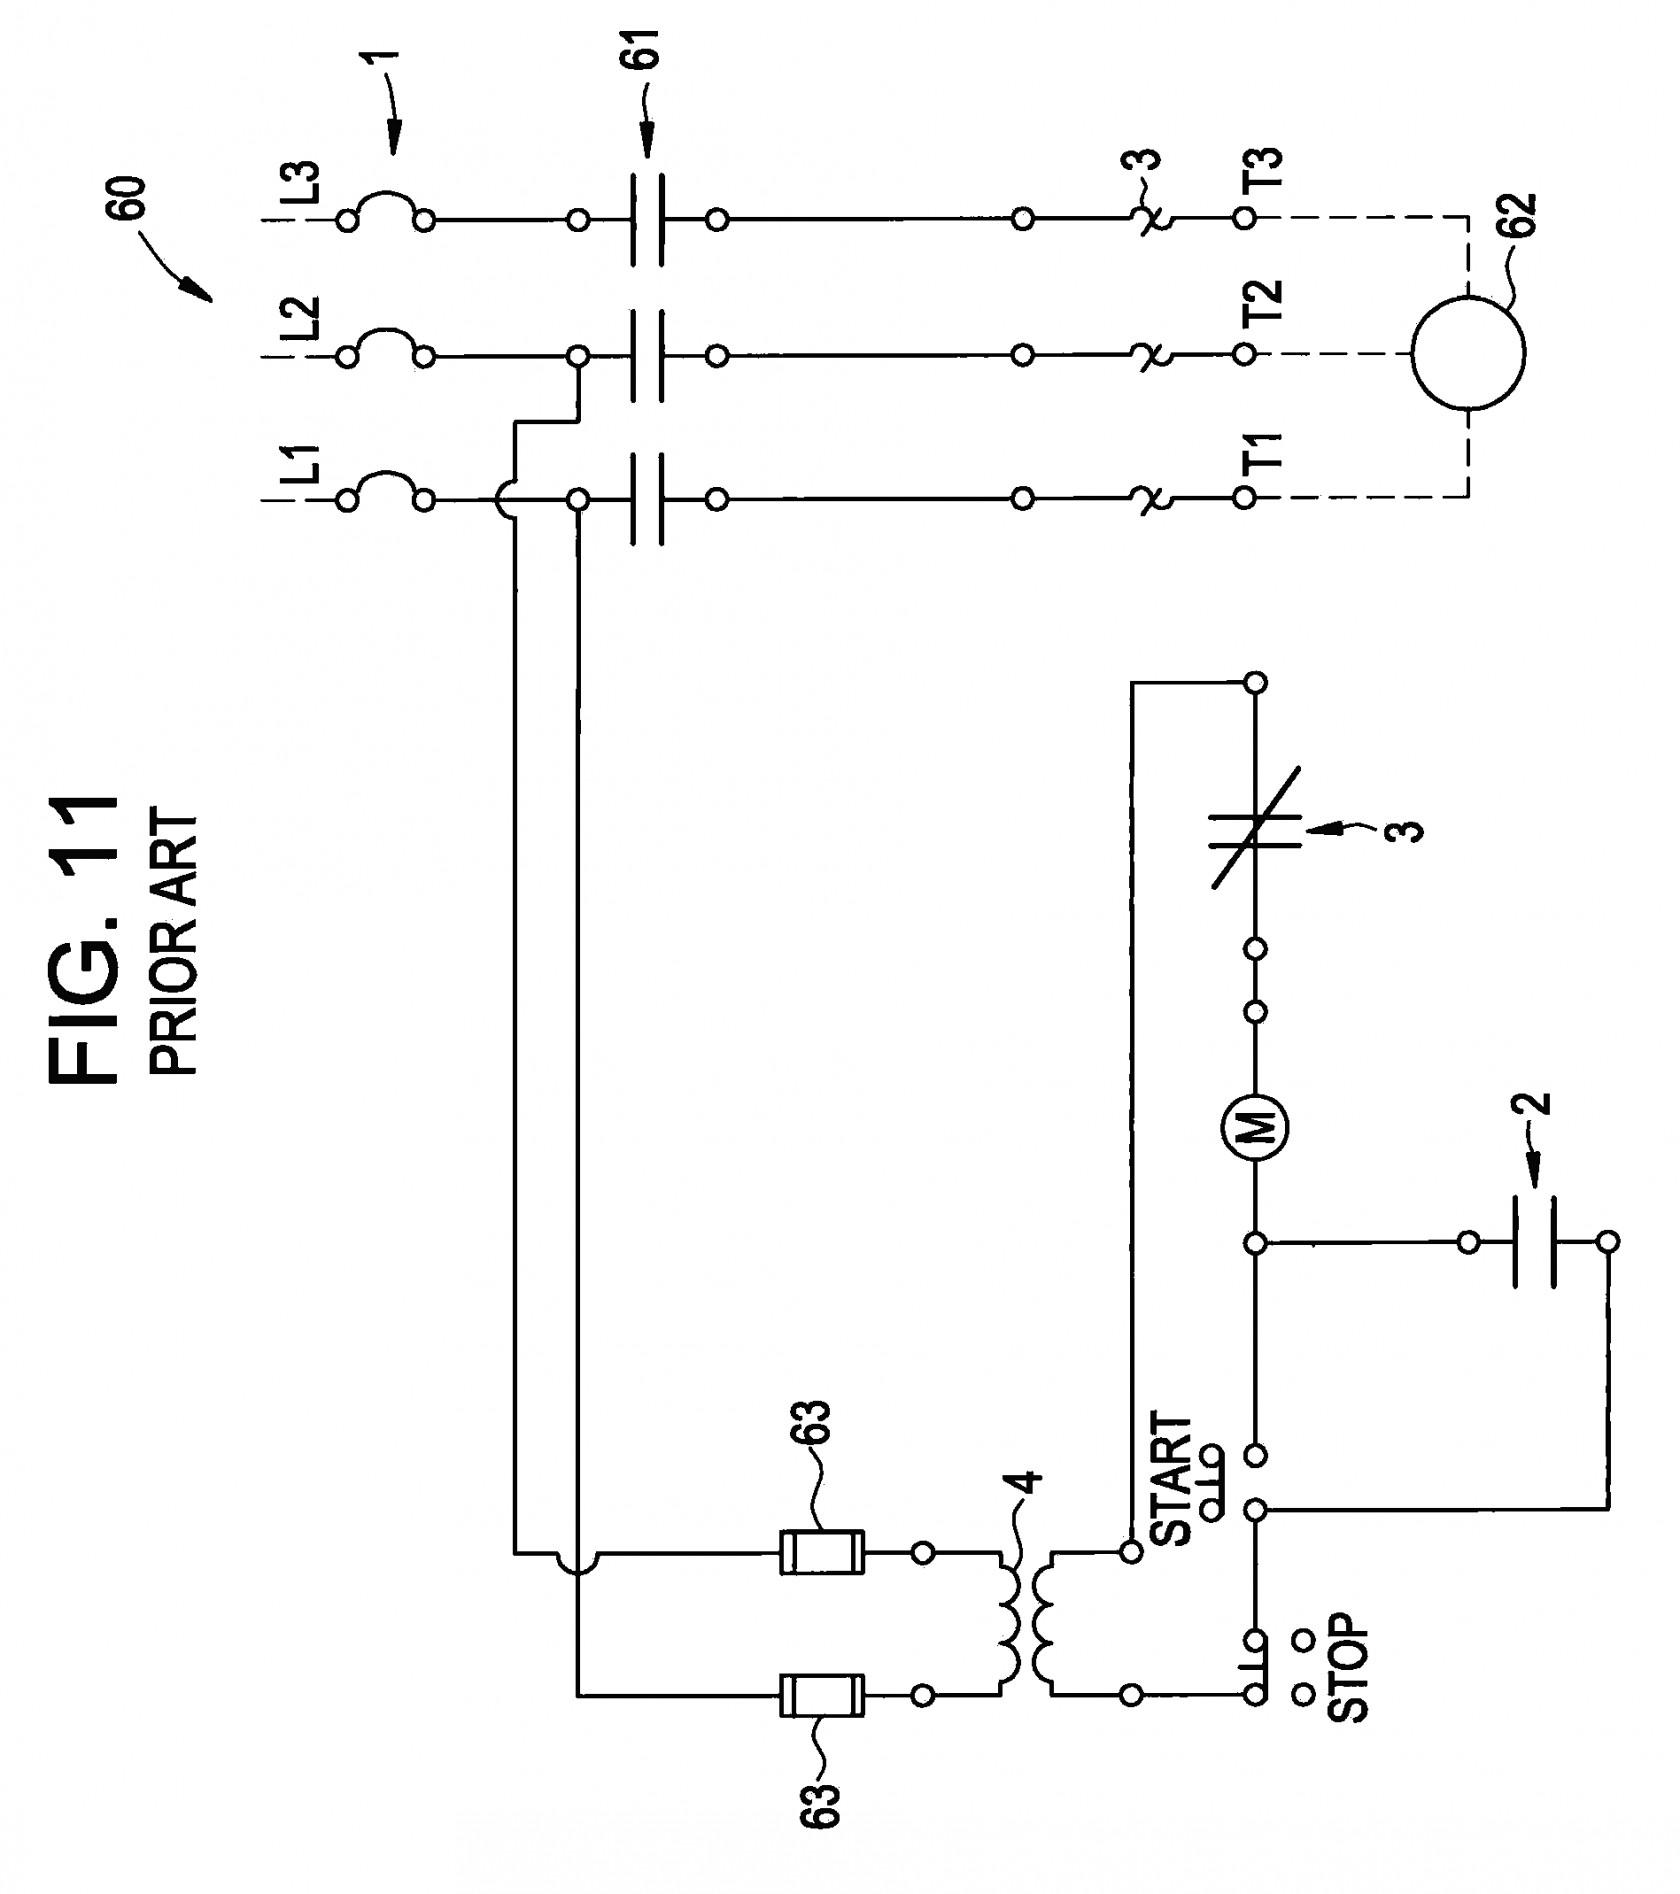 Cutler Hammer Motor Starter Wiring Diagram Replacing Contacts Nema Size Starters Schneider Eaton Motor Of Cutler Hammer Motor Starter Wiring Diagram